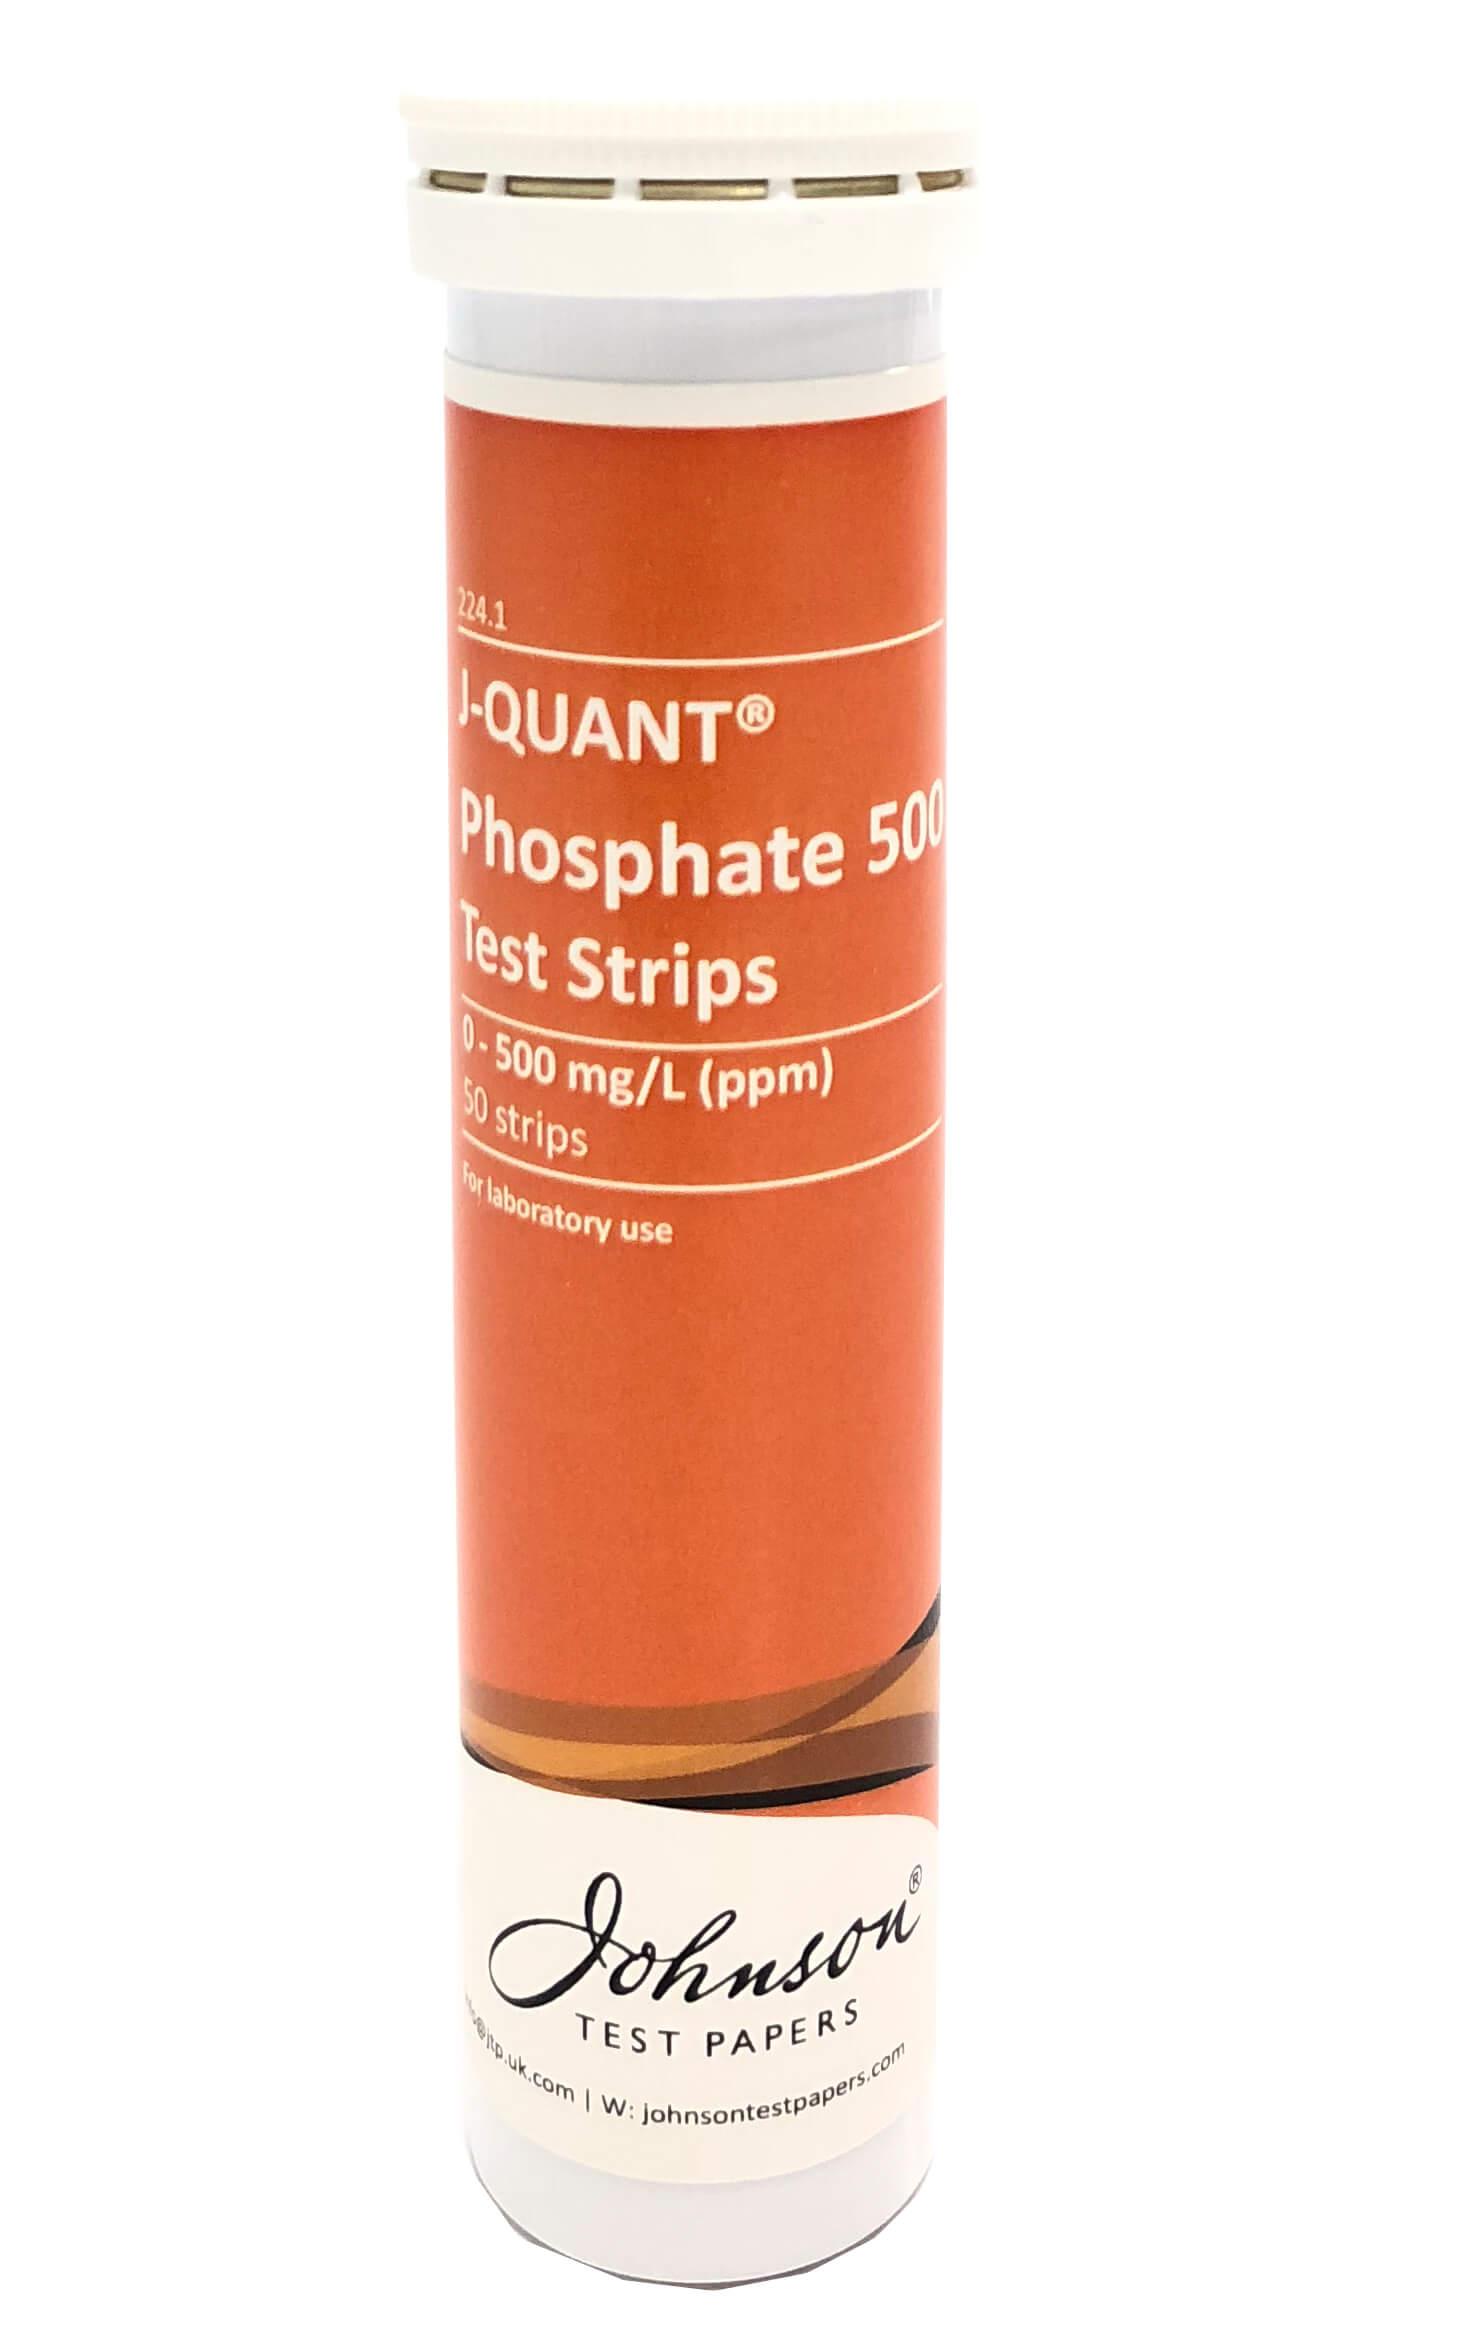 J-QUANT<sup>®</sup> Phosphate